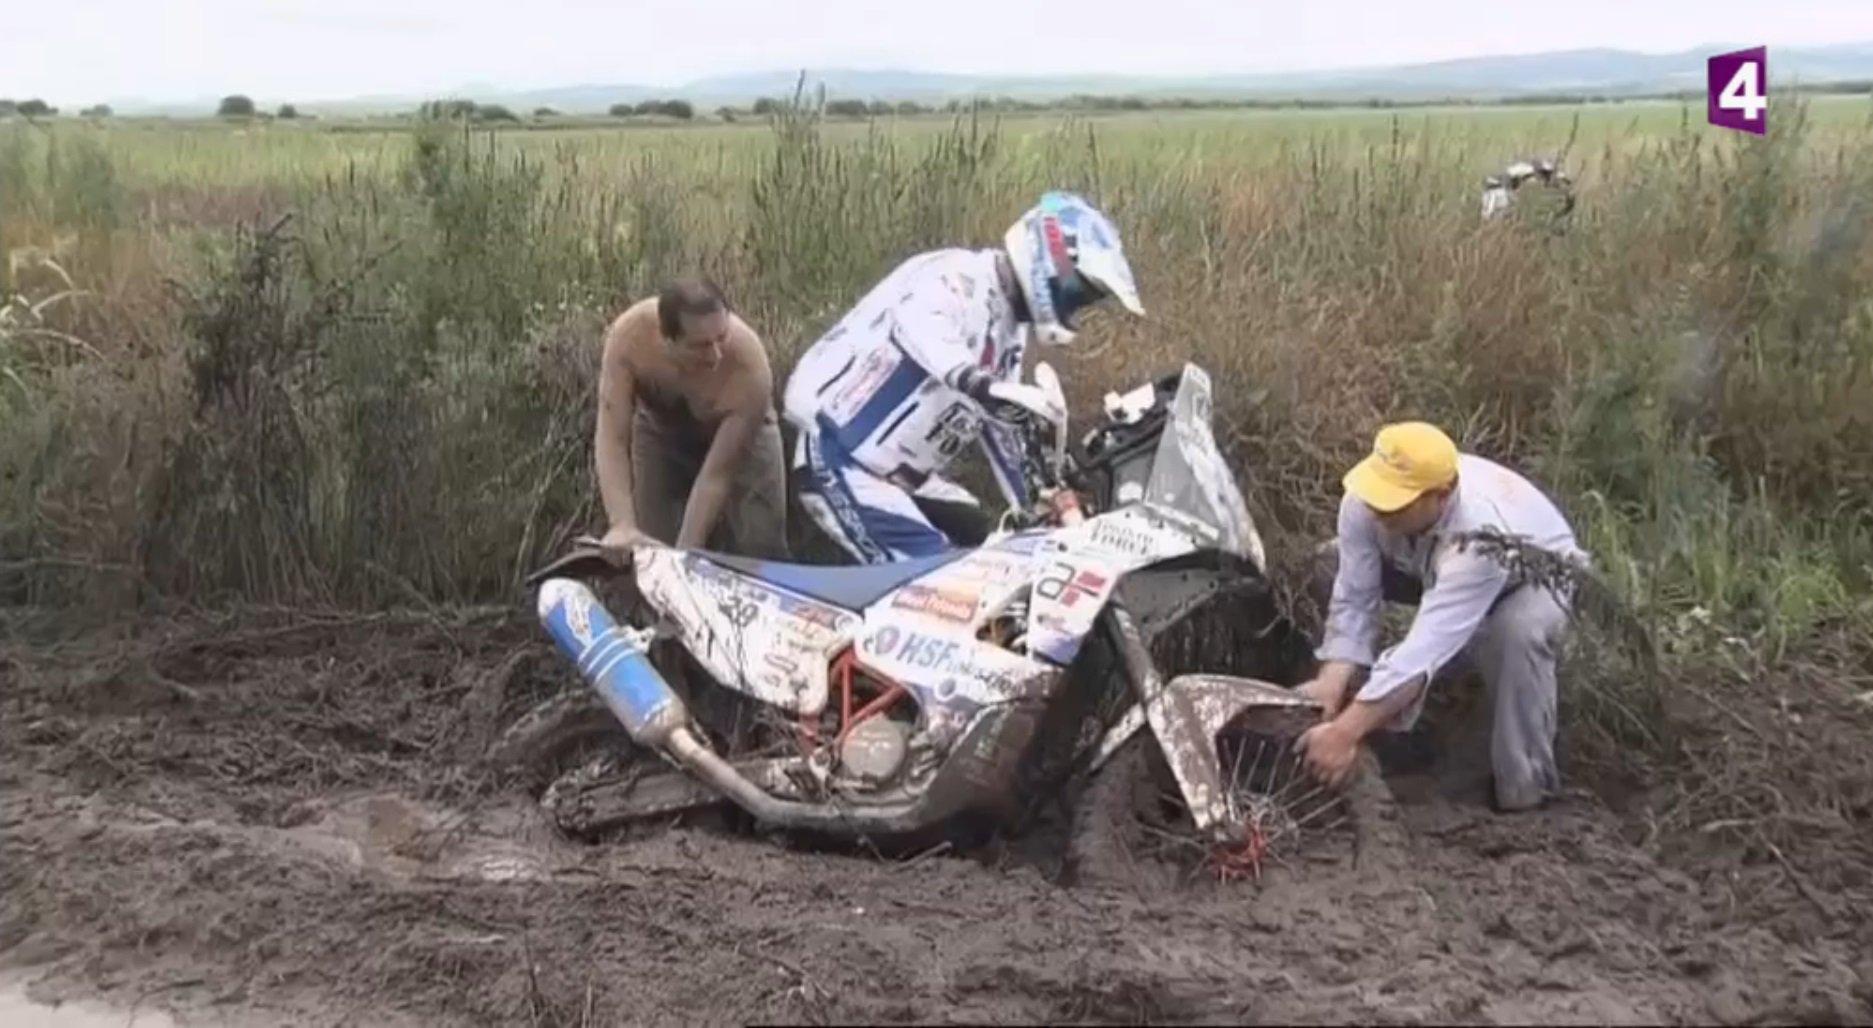 2016 Rallye Raid Dakar Argentina - Bolivia [3-16 Enero] - Página 6 CX5ZTsGW8AQ-3Do